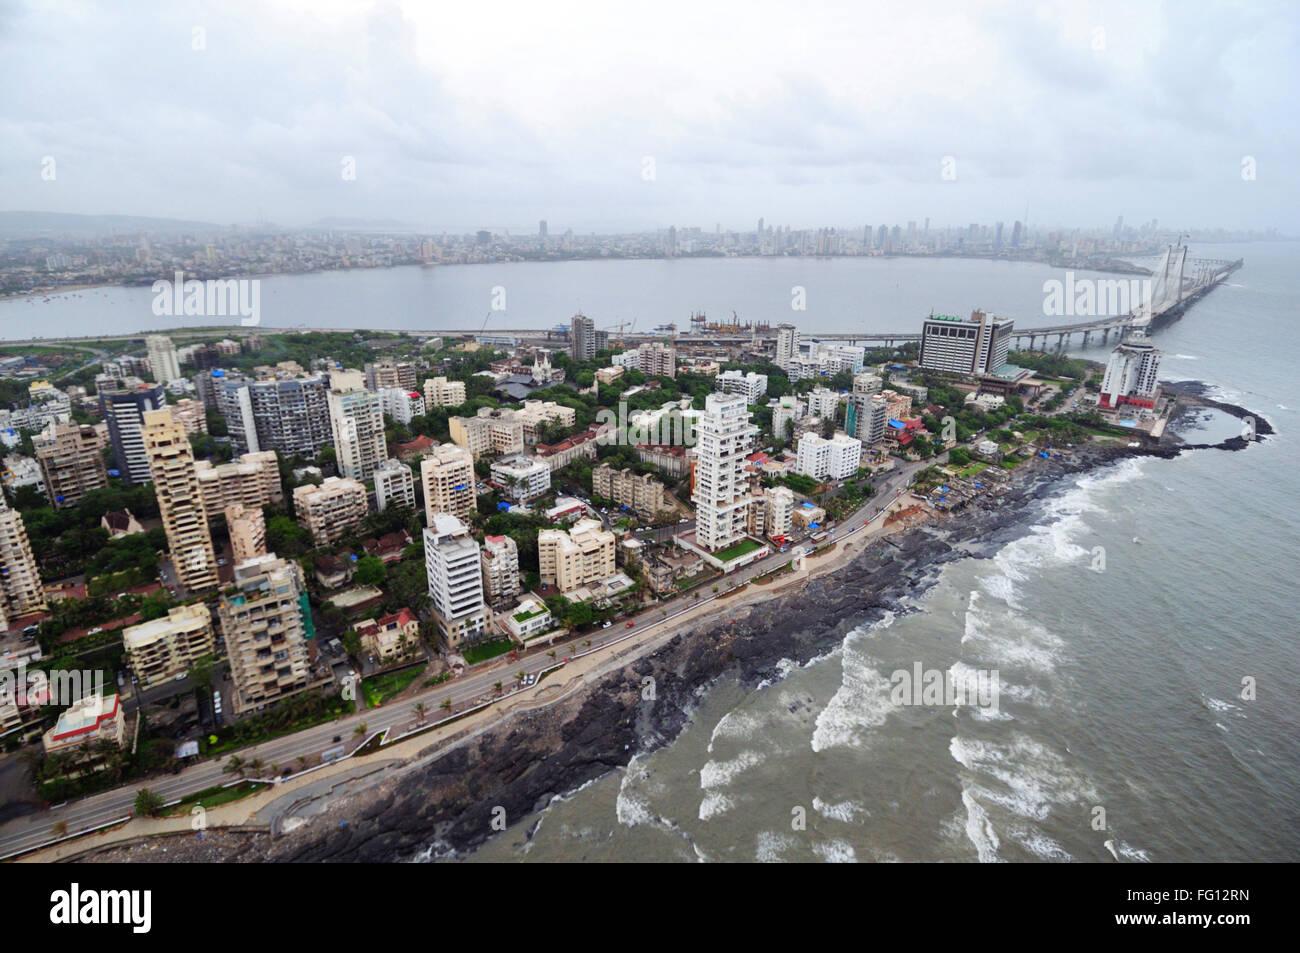 aerial view of bandra band stand with bandra worli rajiv gandhi sea link ; Bombay Mumbai ; Maharashtra ; India - Stock Image